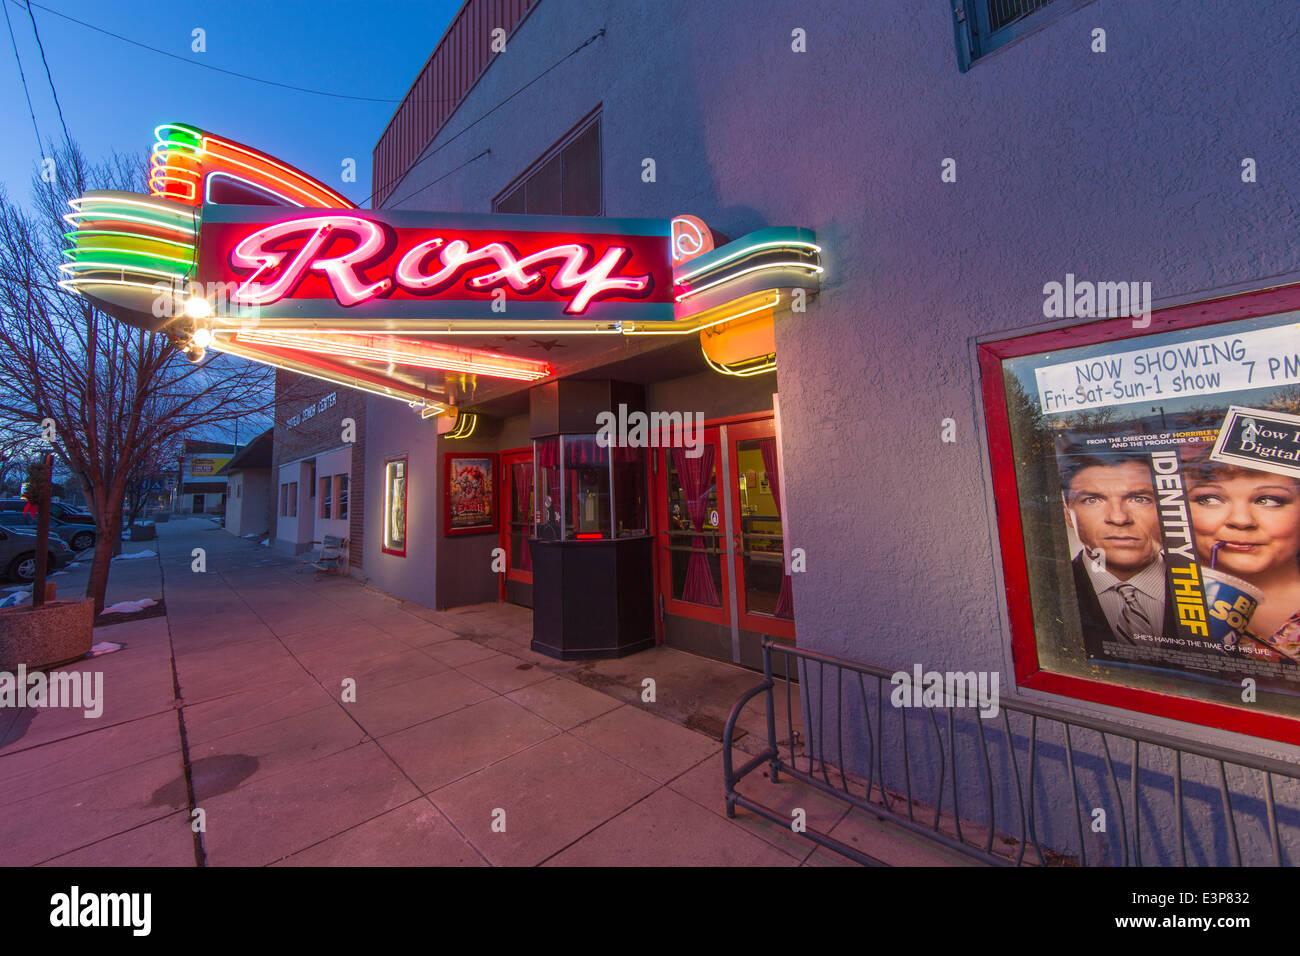 Shelby, Montana movie theatre | Polson Theatres, Inc. |Roxy Theatre Montana